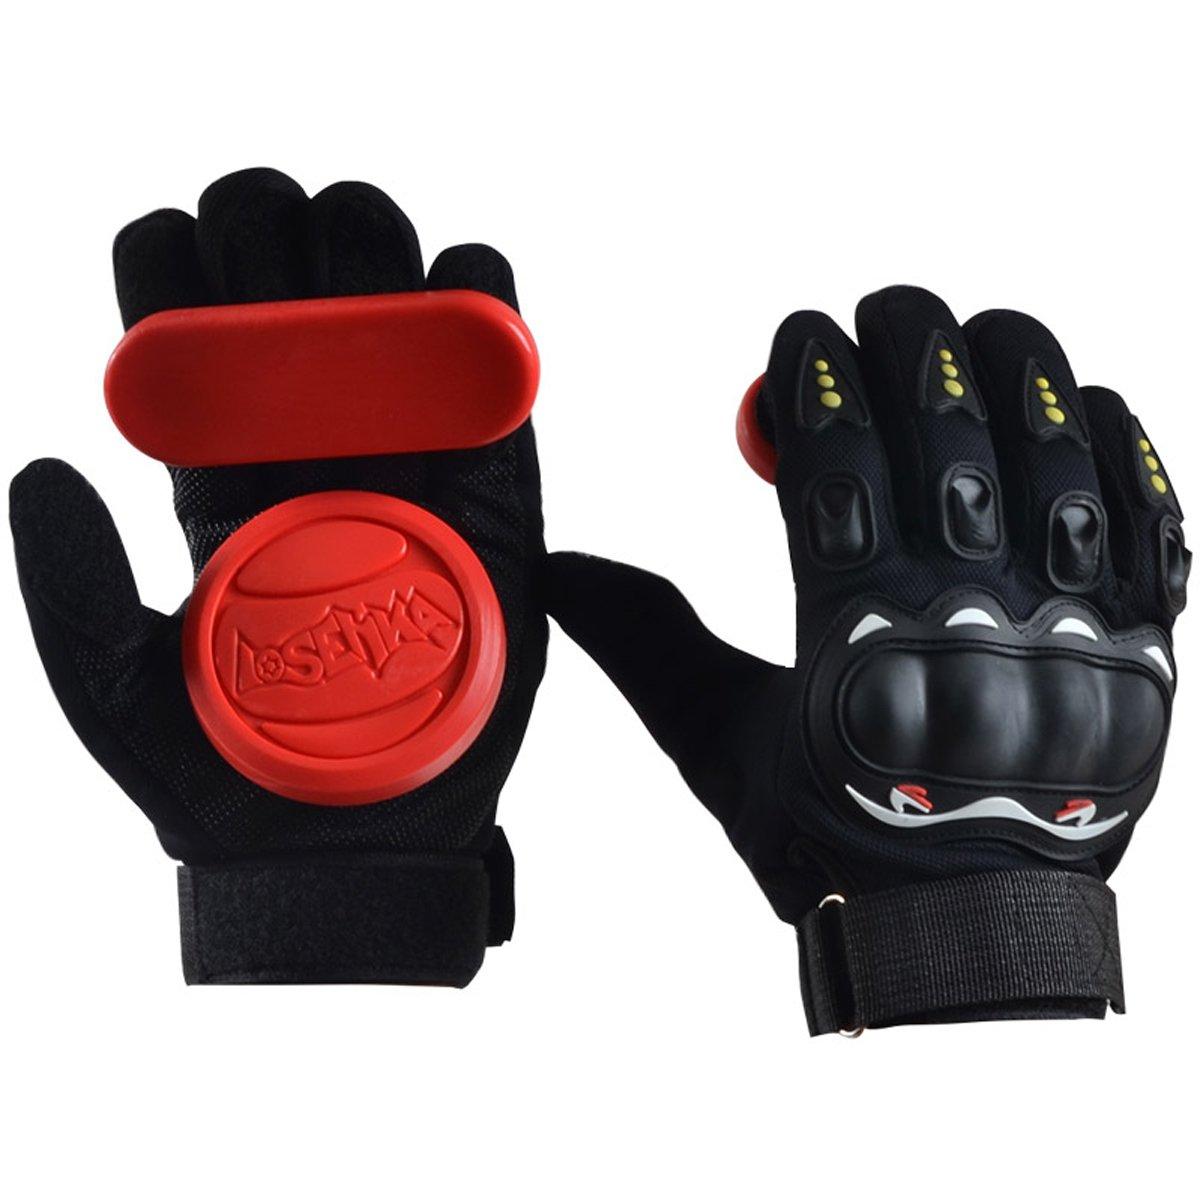 LOSENKA Professional Grip Longboard Skateboard Downhill Sliding Gloves with Slide Blocks Slider Foam Palm Hand Wrist Guards Protector Protective Gear for Skateboarding by LOSENKA